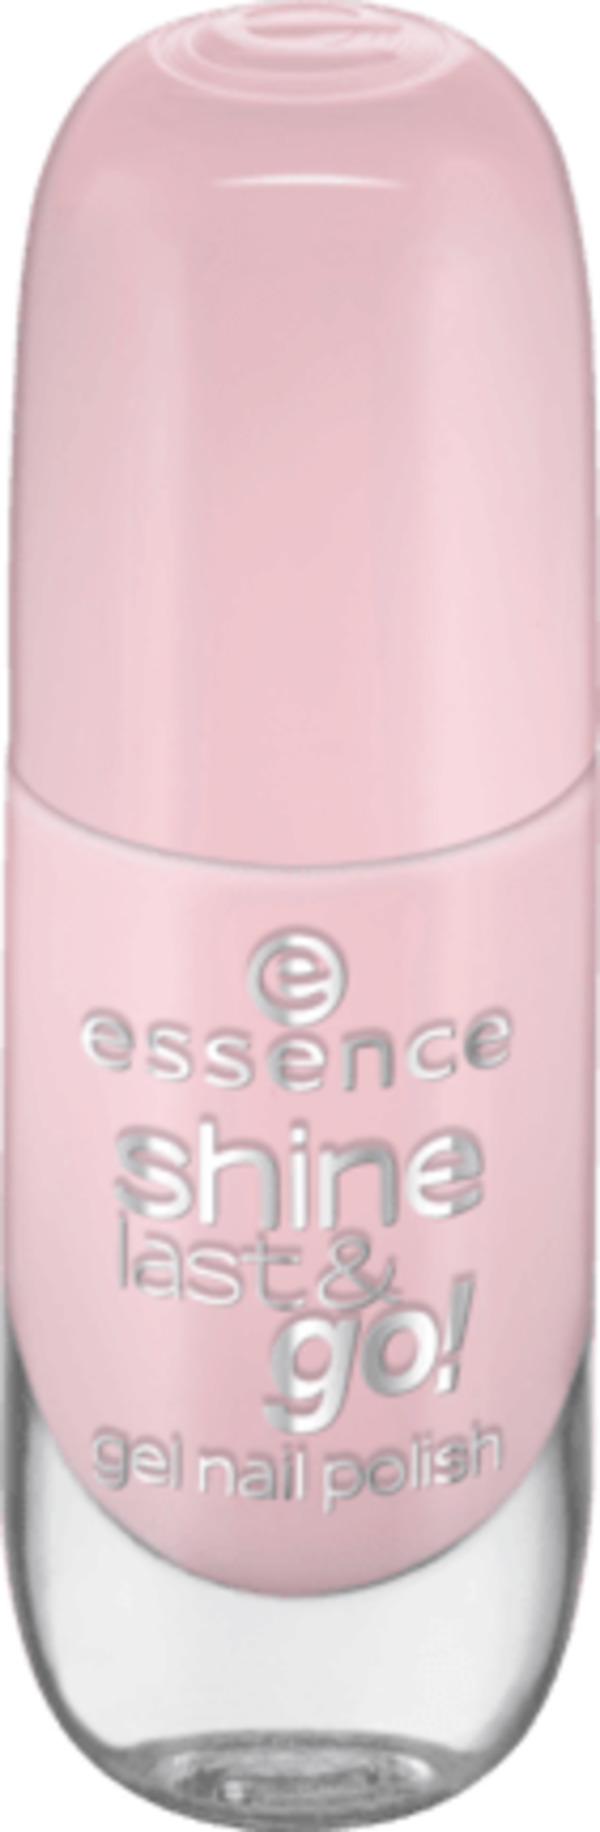 essence cosmetics Nagellack shine last & go! gel nail polish nude 05